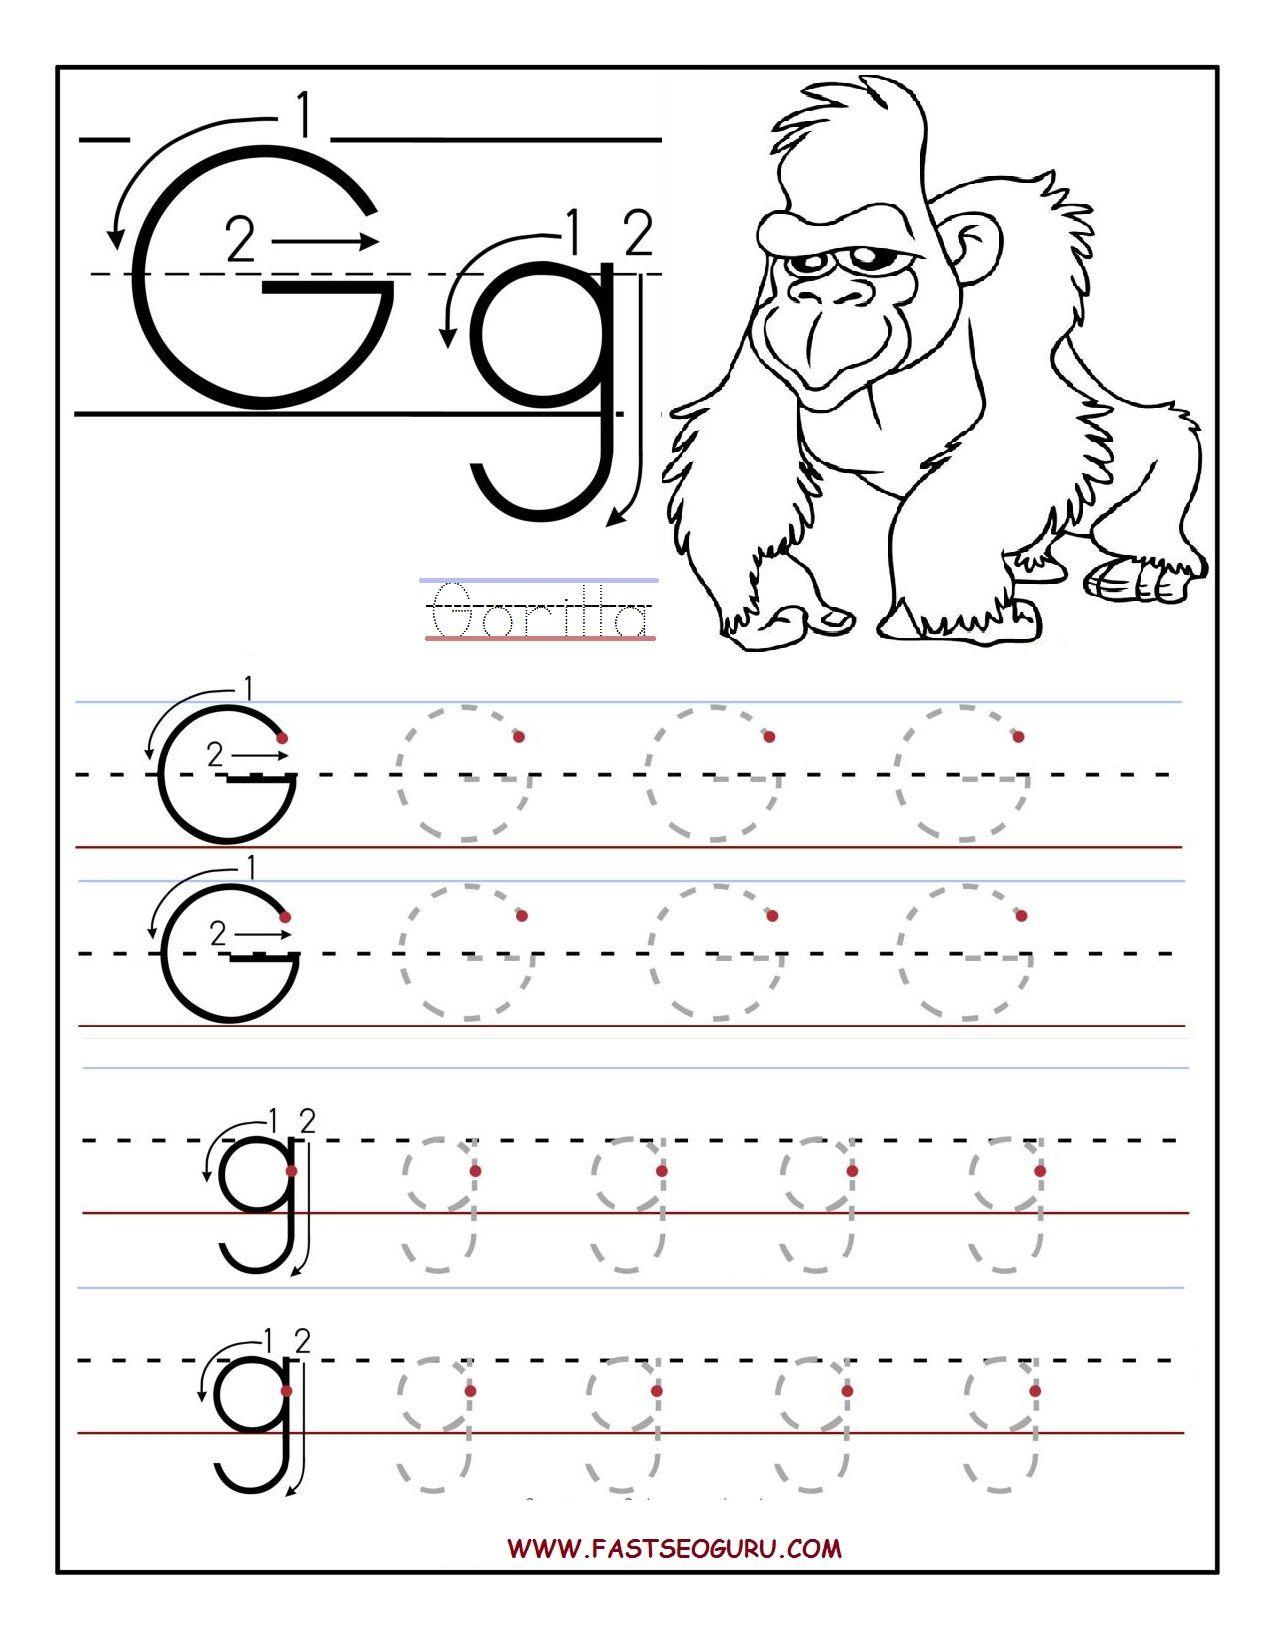 Printable Letter G Tracing Worksheets For Preschool | 파닉스 regarding Letter G Worksheets For Pre K